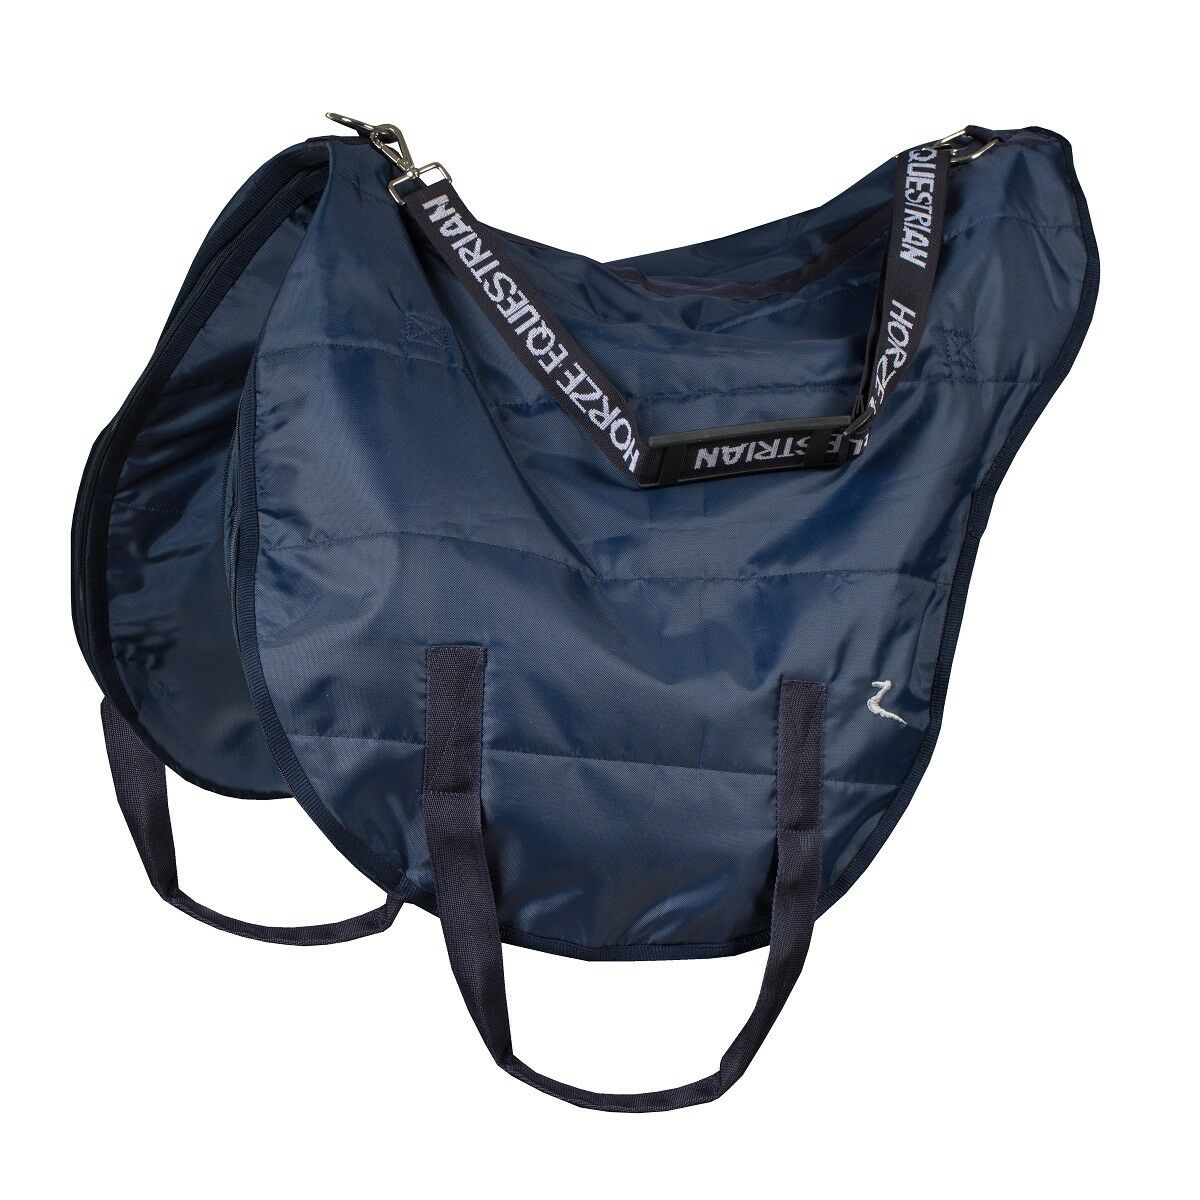 Horze Equestrian English Navy Carry Strap Nylon All Purpose English Equestrian Dressage Saddle Bag 23d2c2